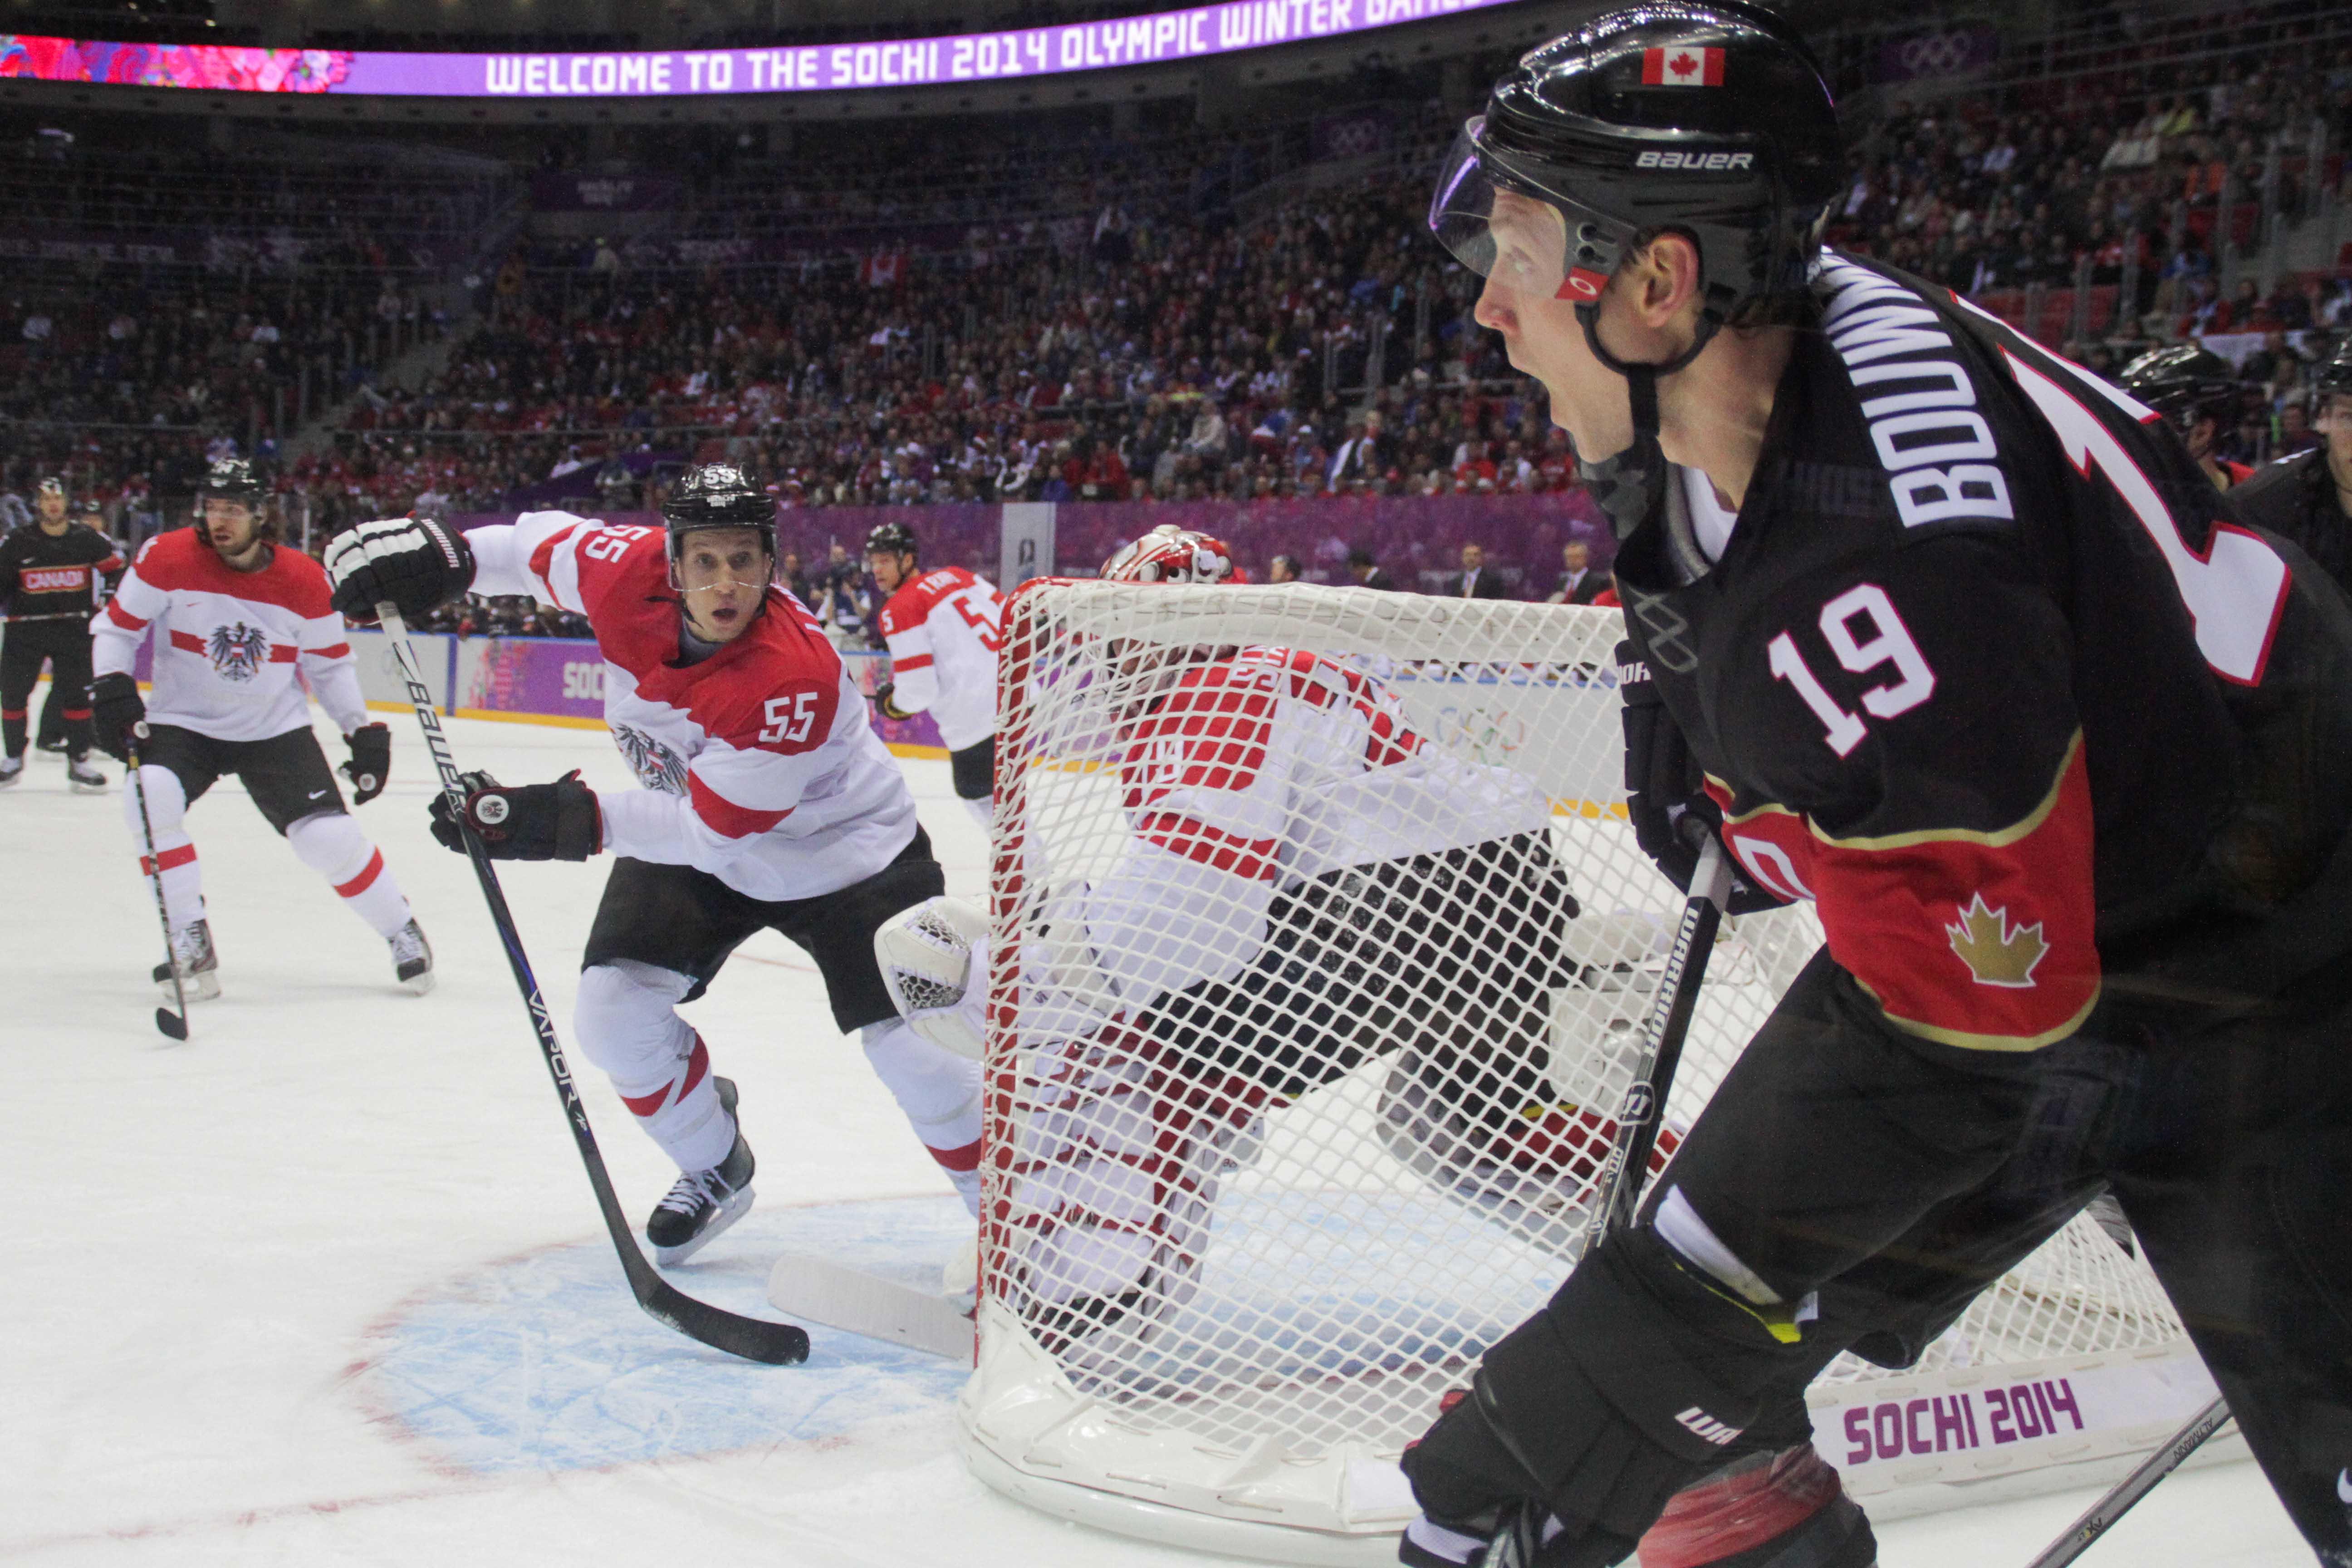 RUS, IIHF, CAN vs AUT, 14.02.2014